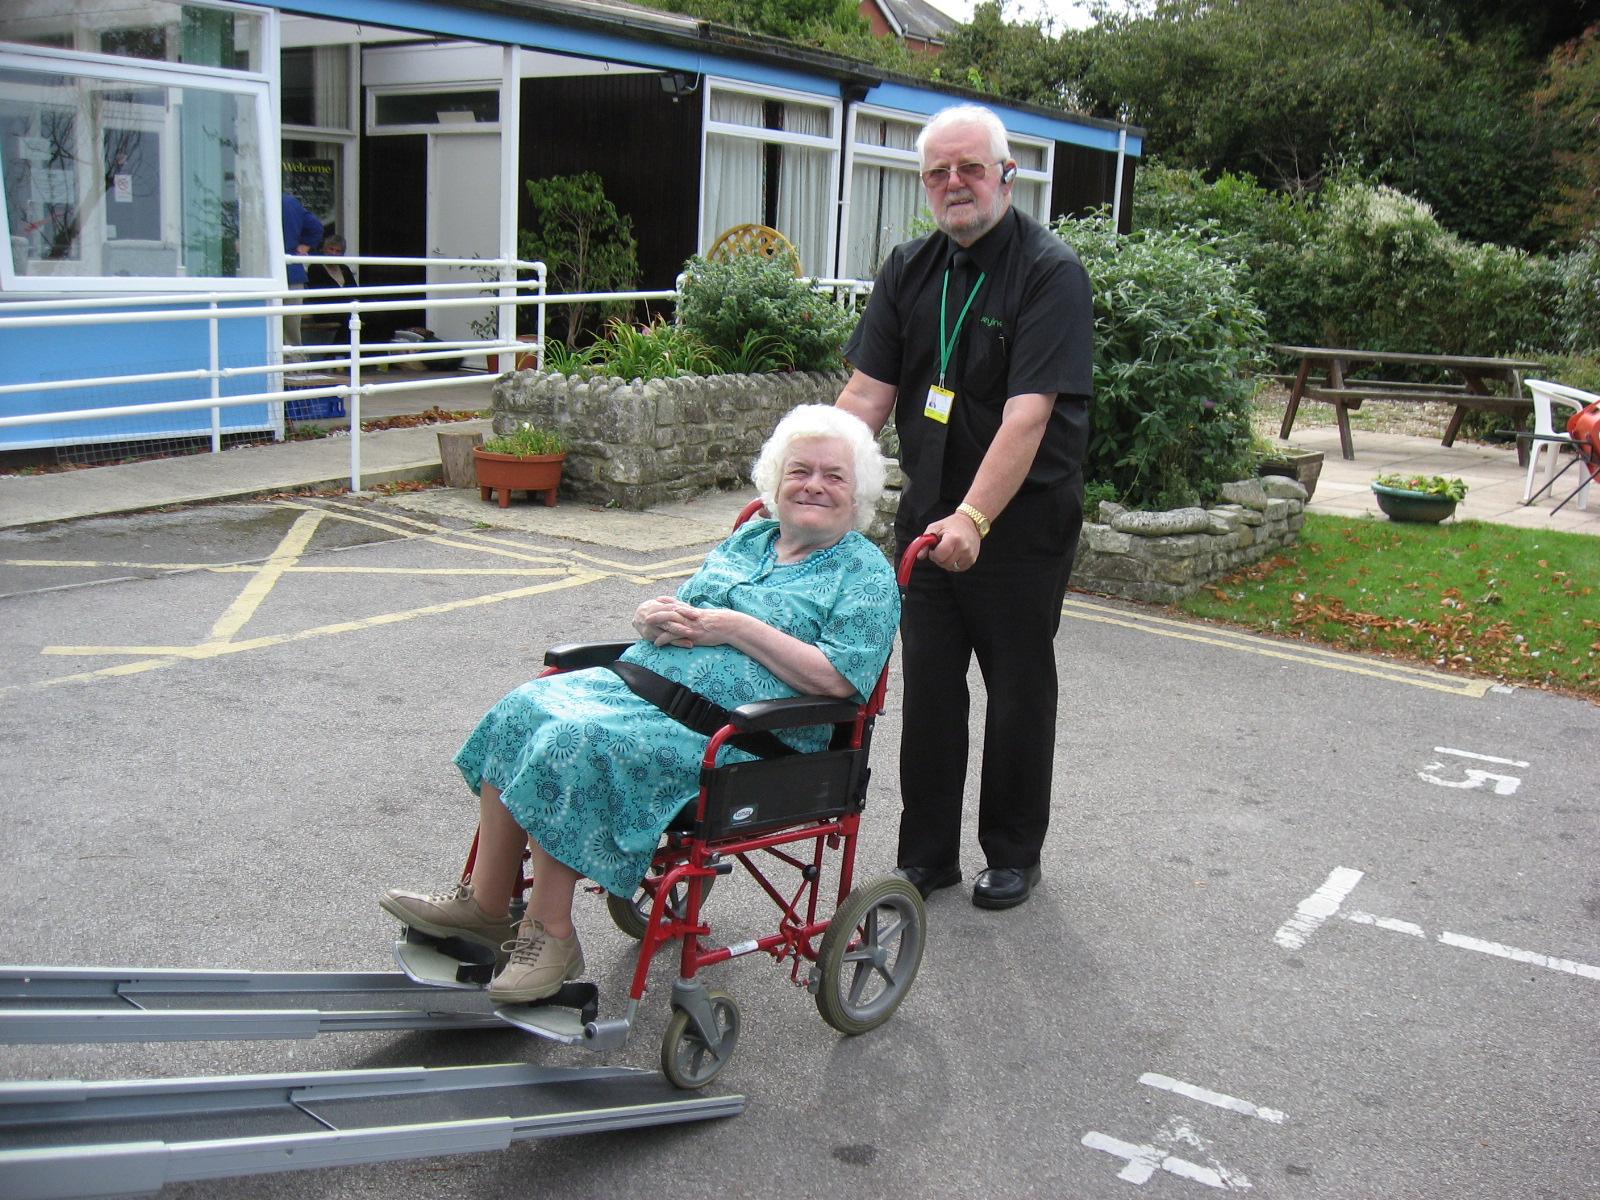 cig bins and wheelchair pics 021